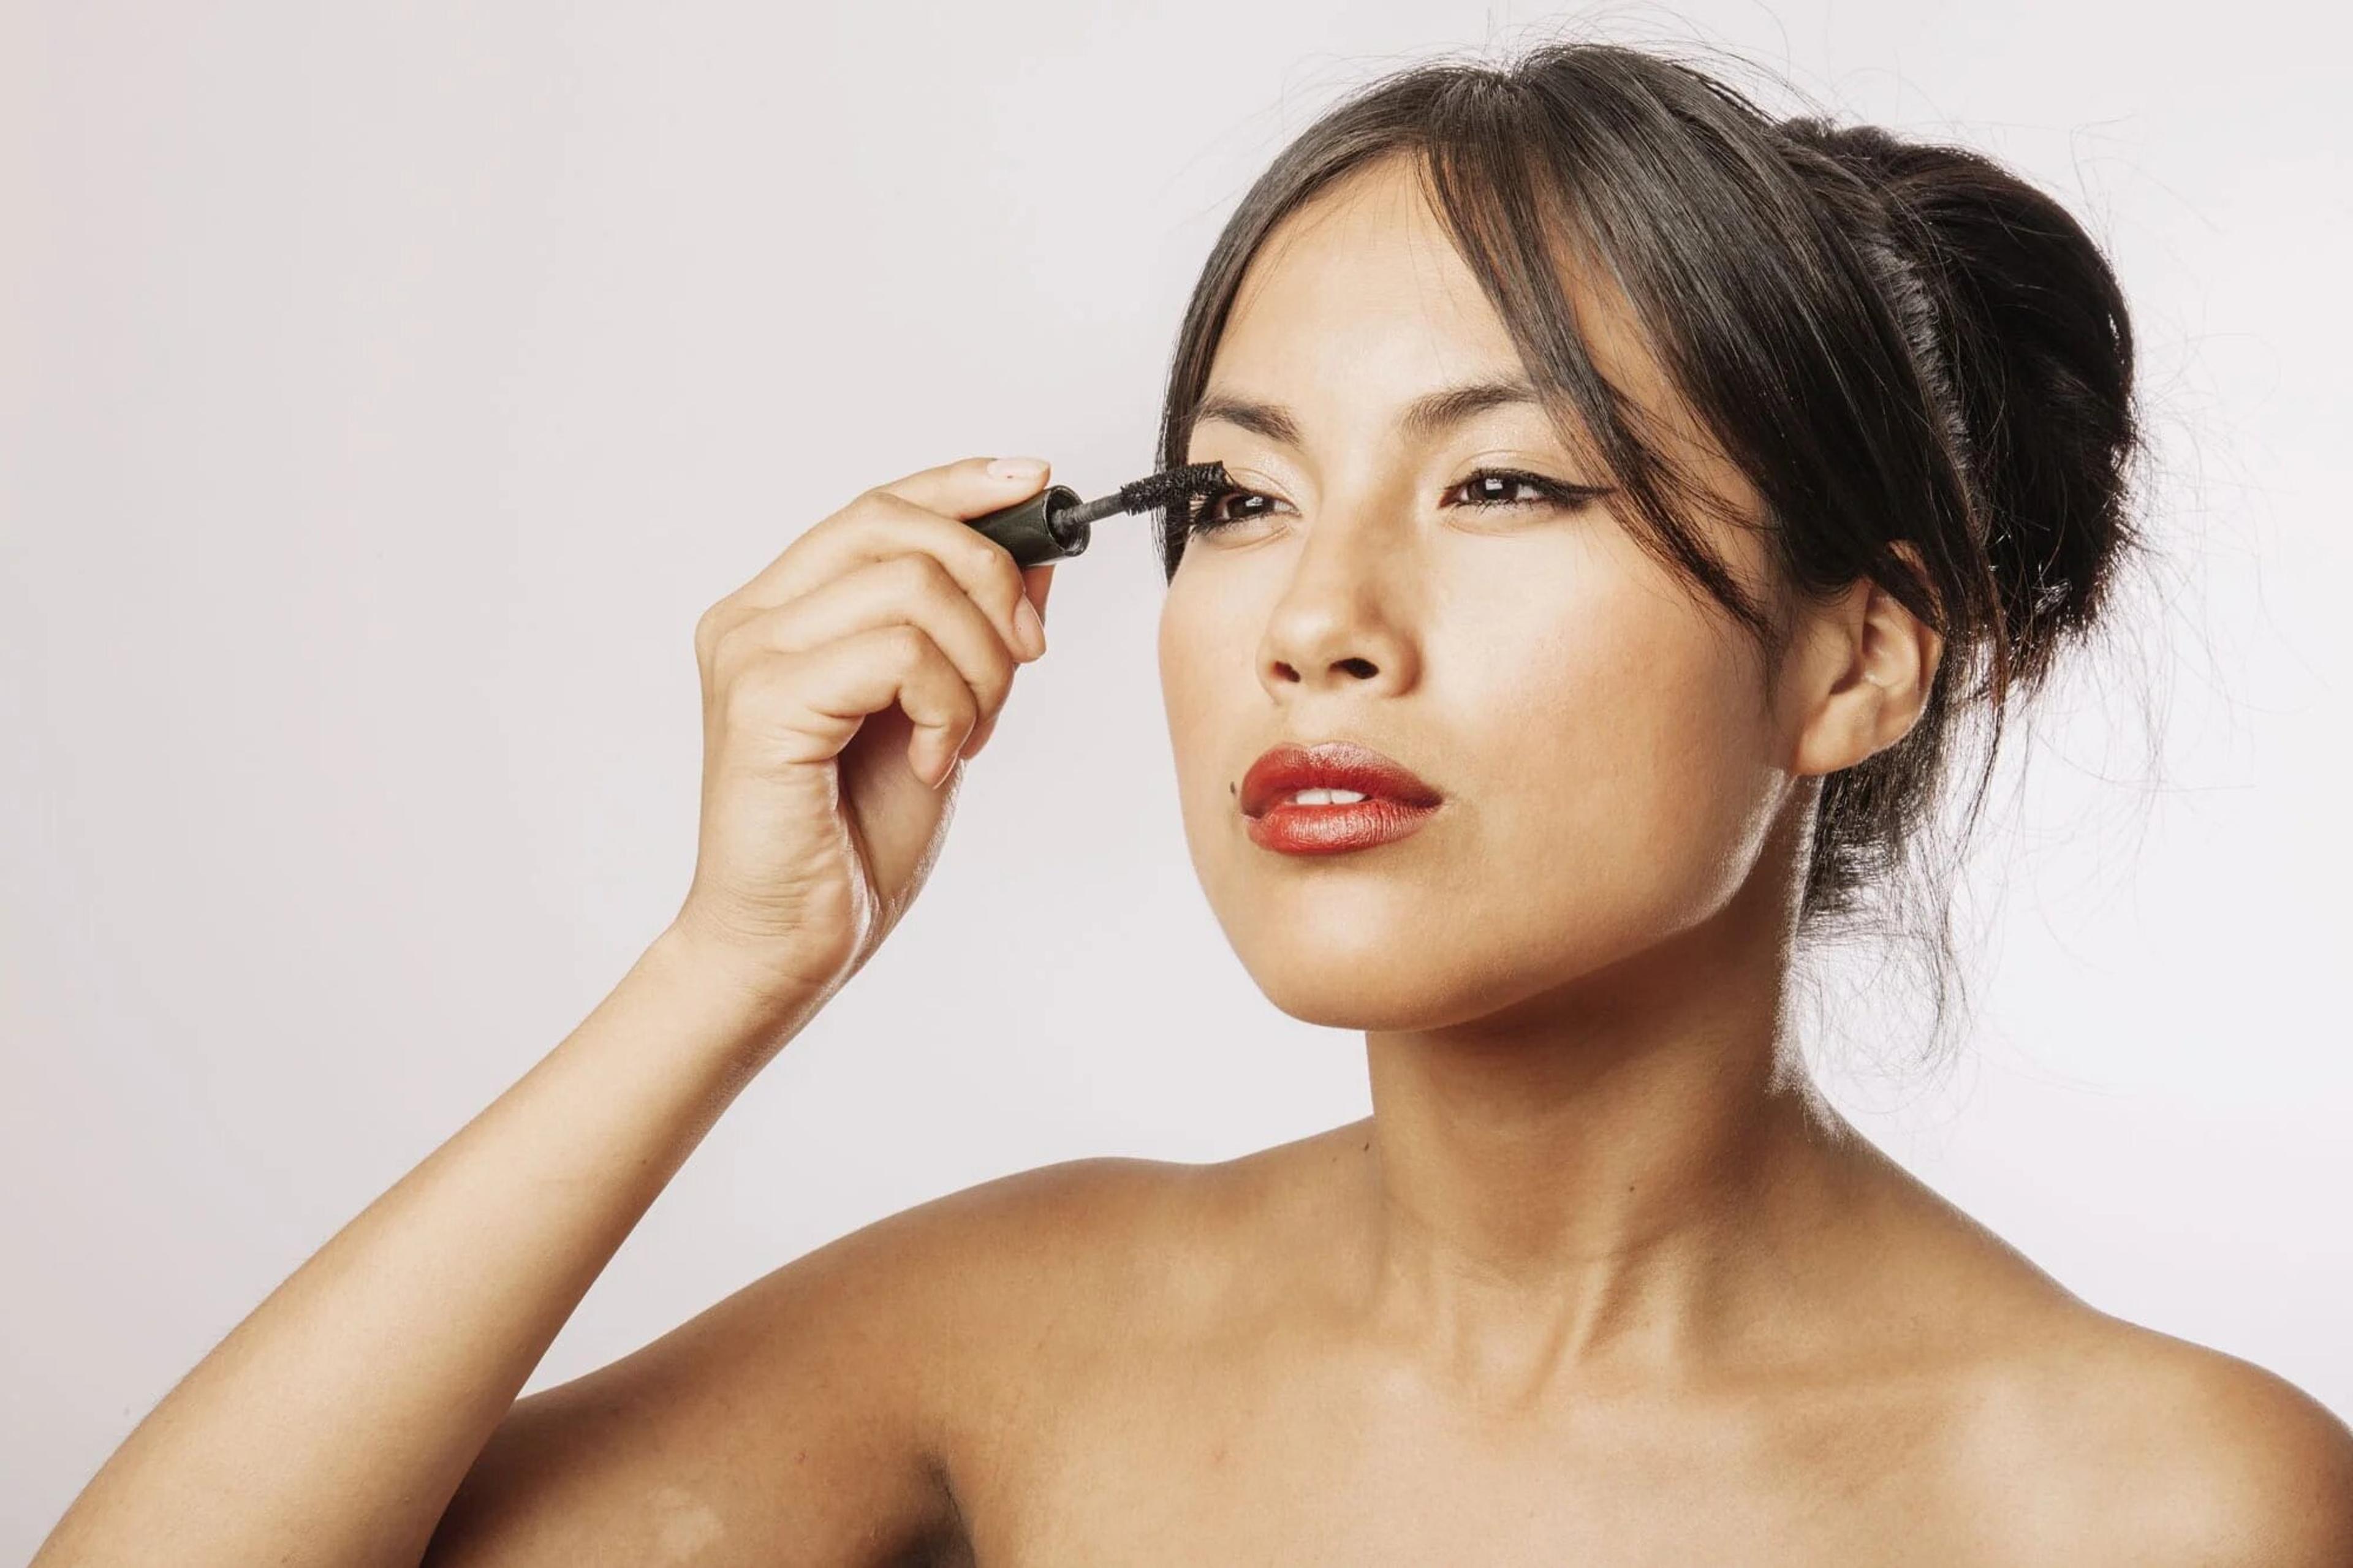 Model applying mascara to her eyes